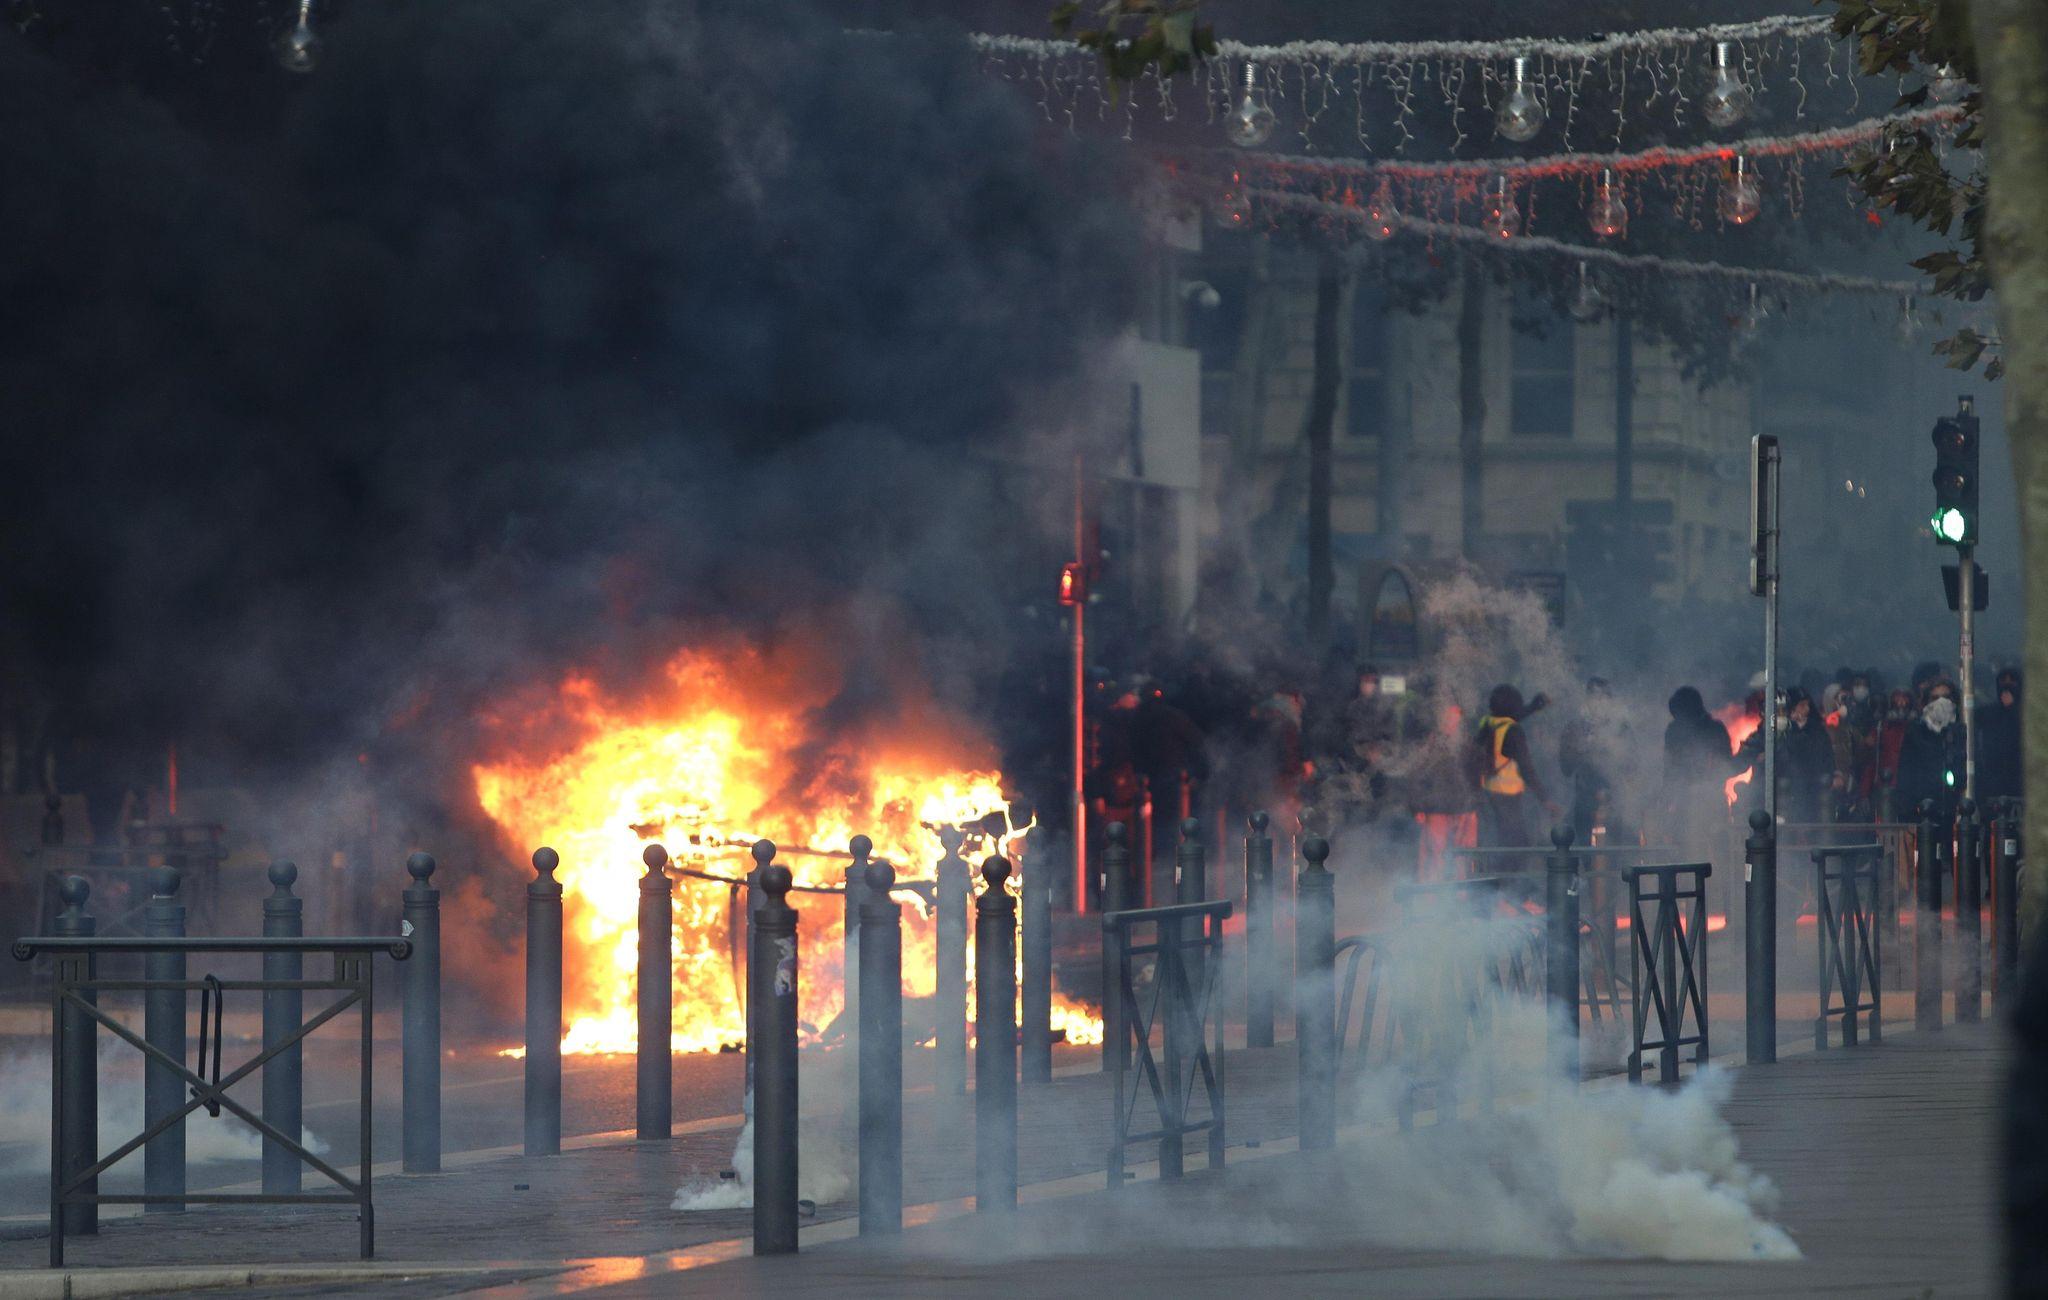 'Grave moment': Macron plans meeting, address amid 'yellow vests' crisis